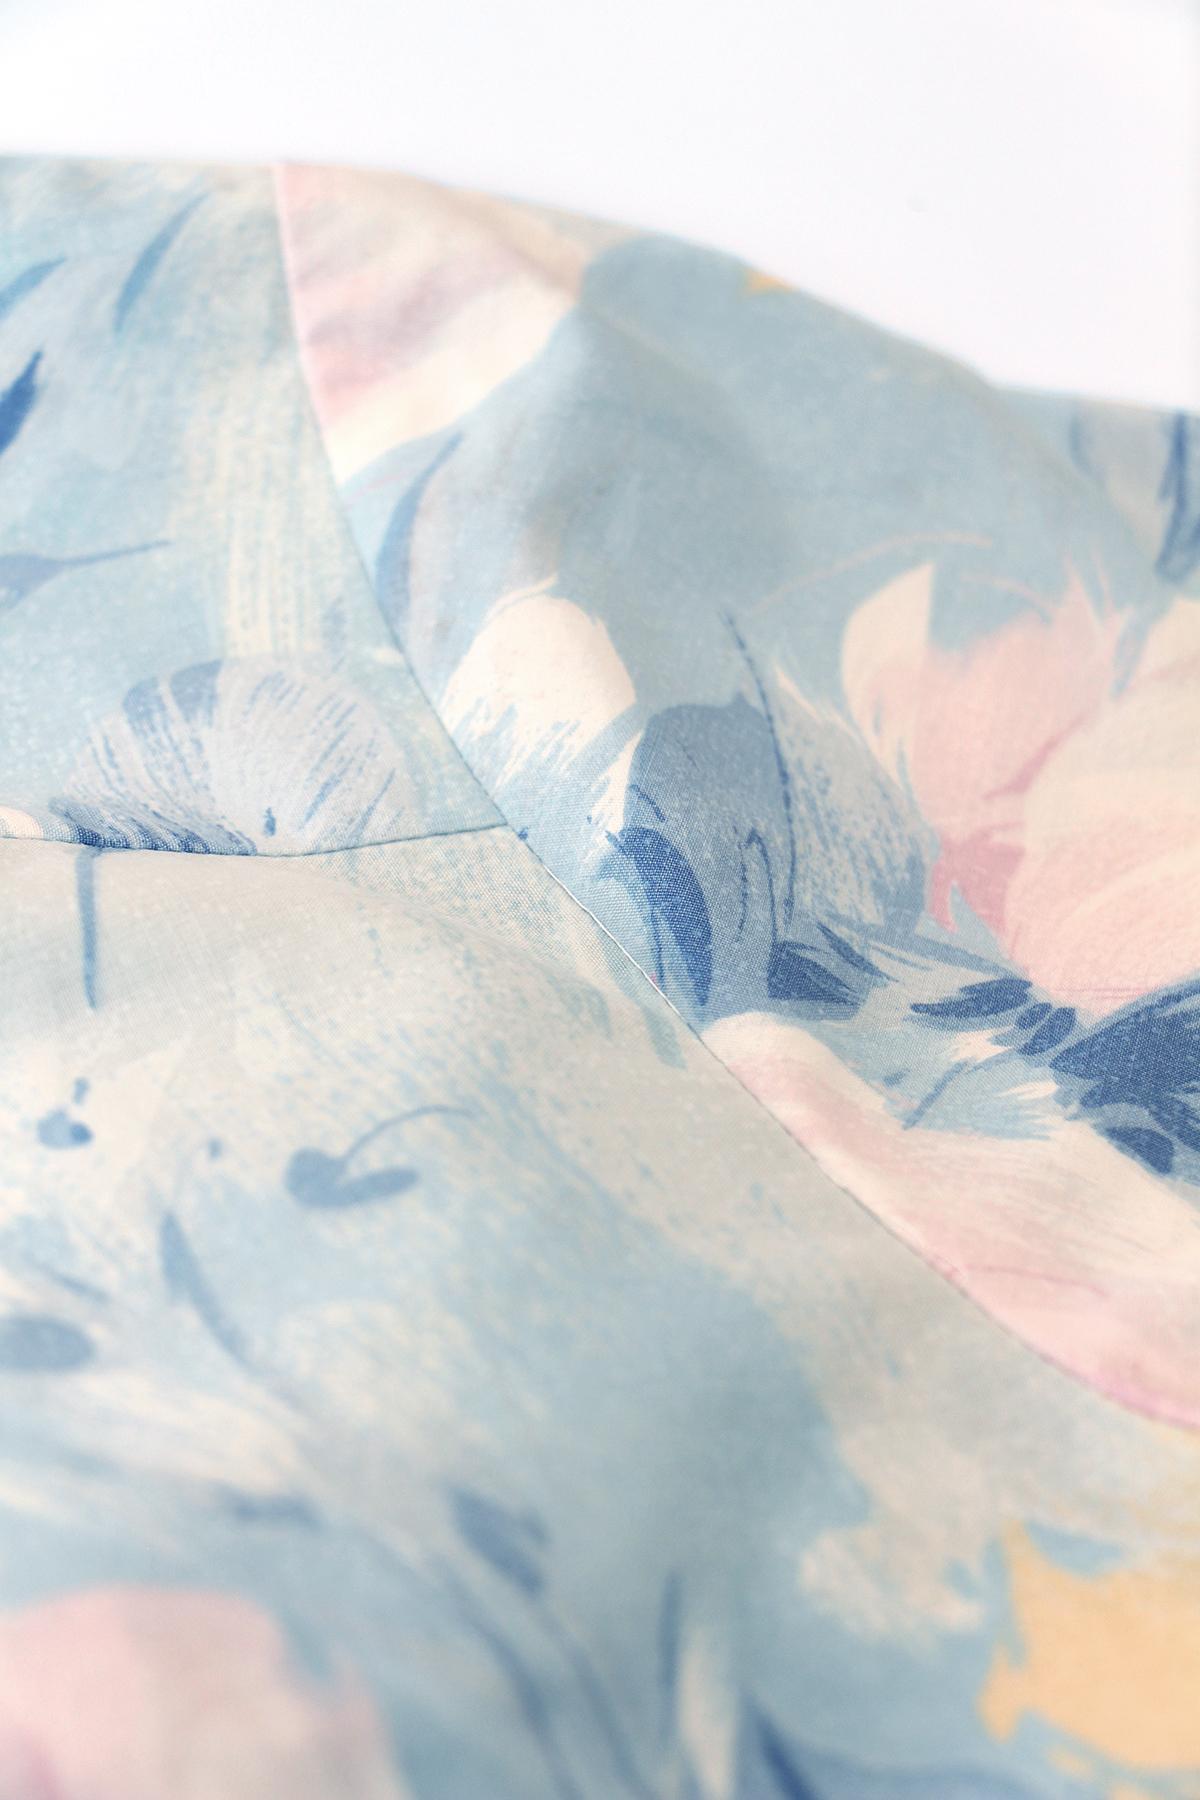 Megan Nielsen Patterns | Matilda Sewalong: Sleeves - Unpicking Your Sleeve Easing Stitches